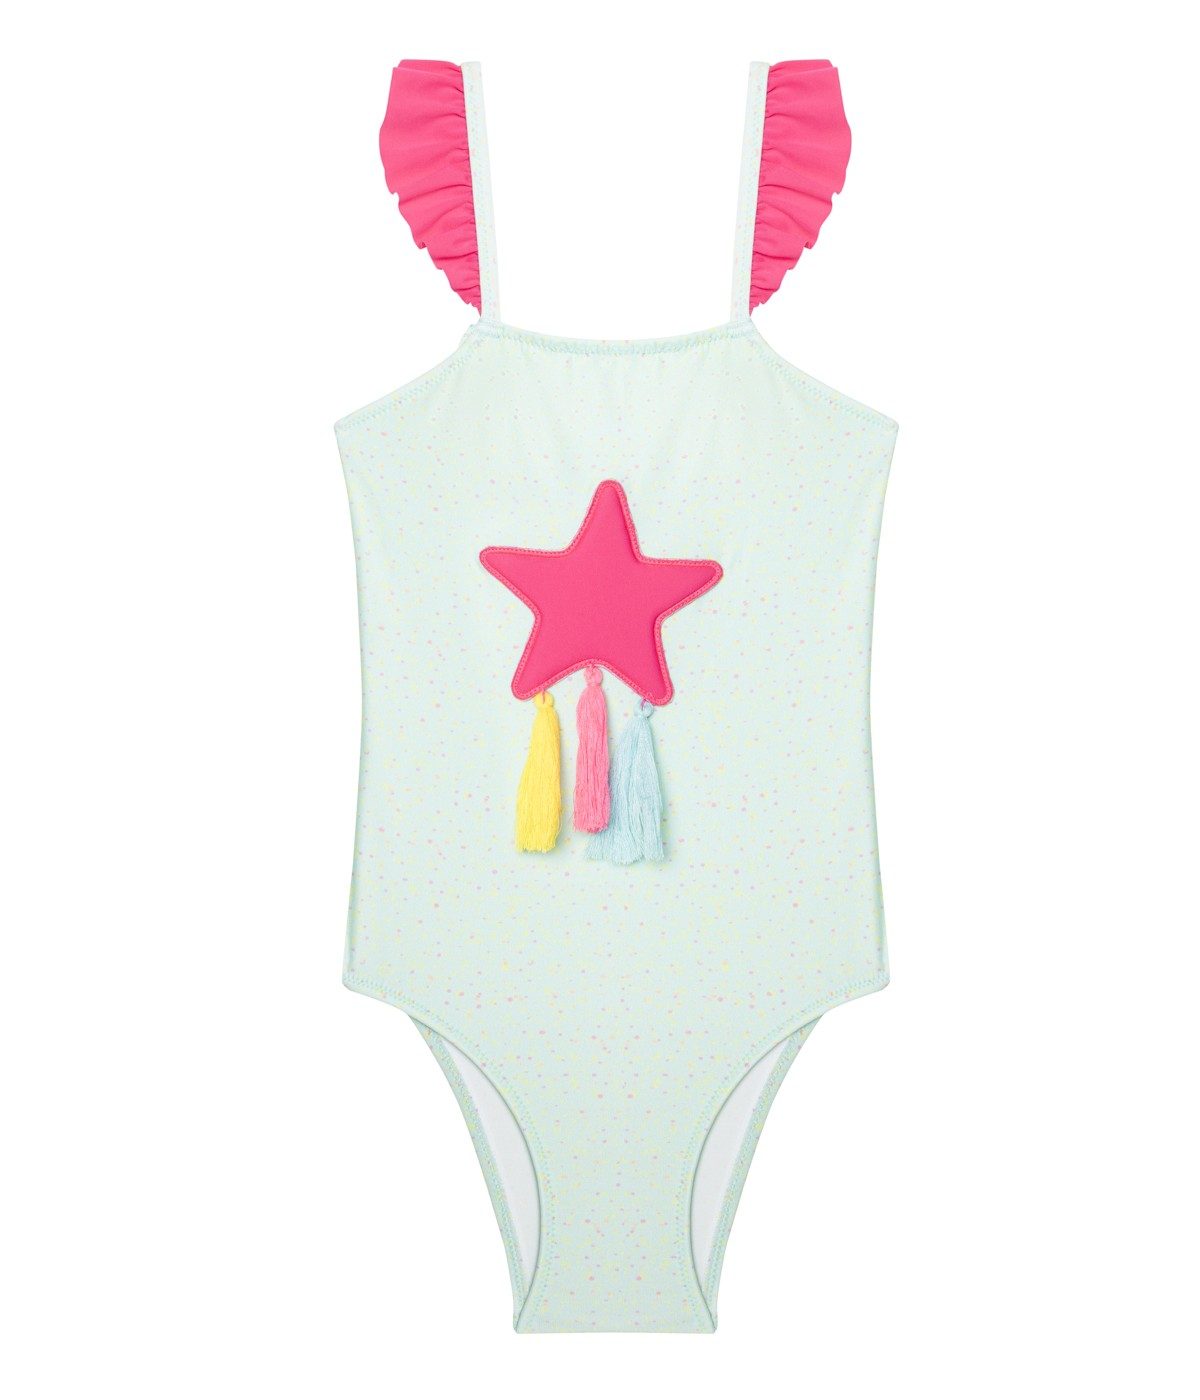 Girls Starfringe Suit